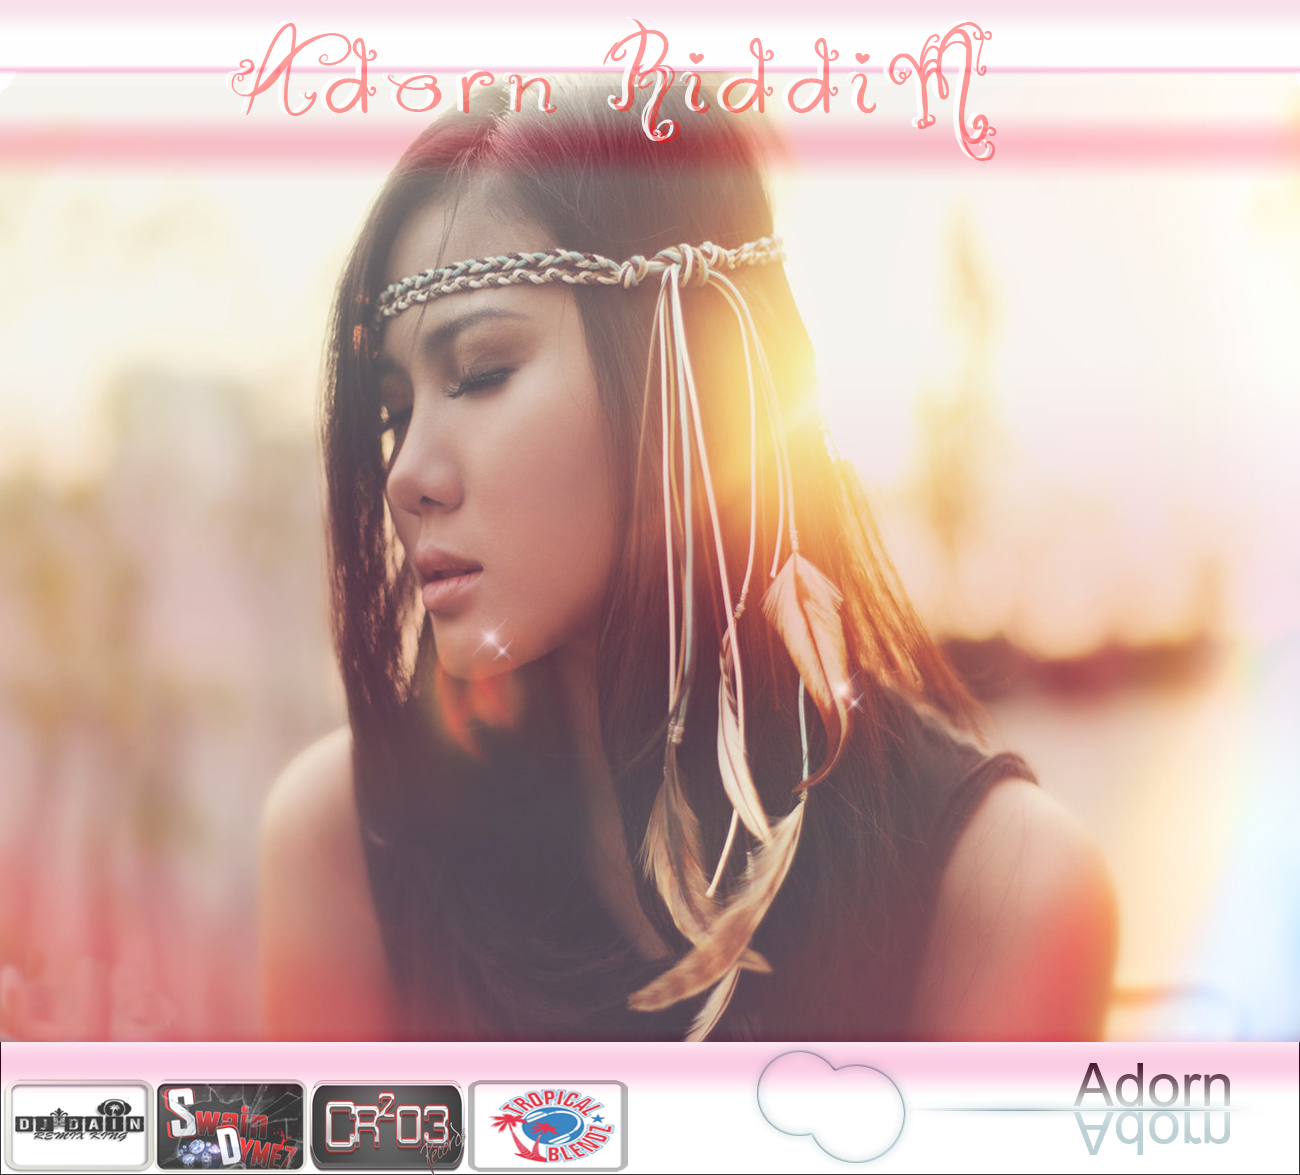 adorn-riddim-cover